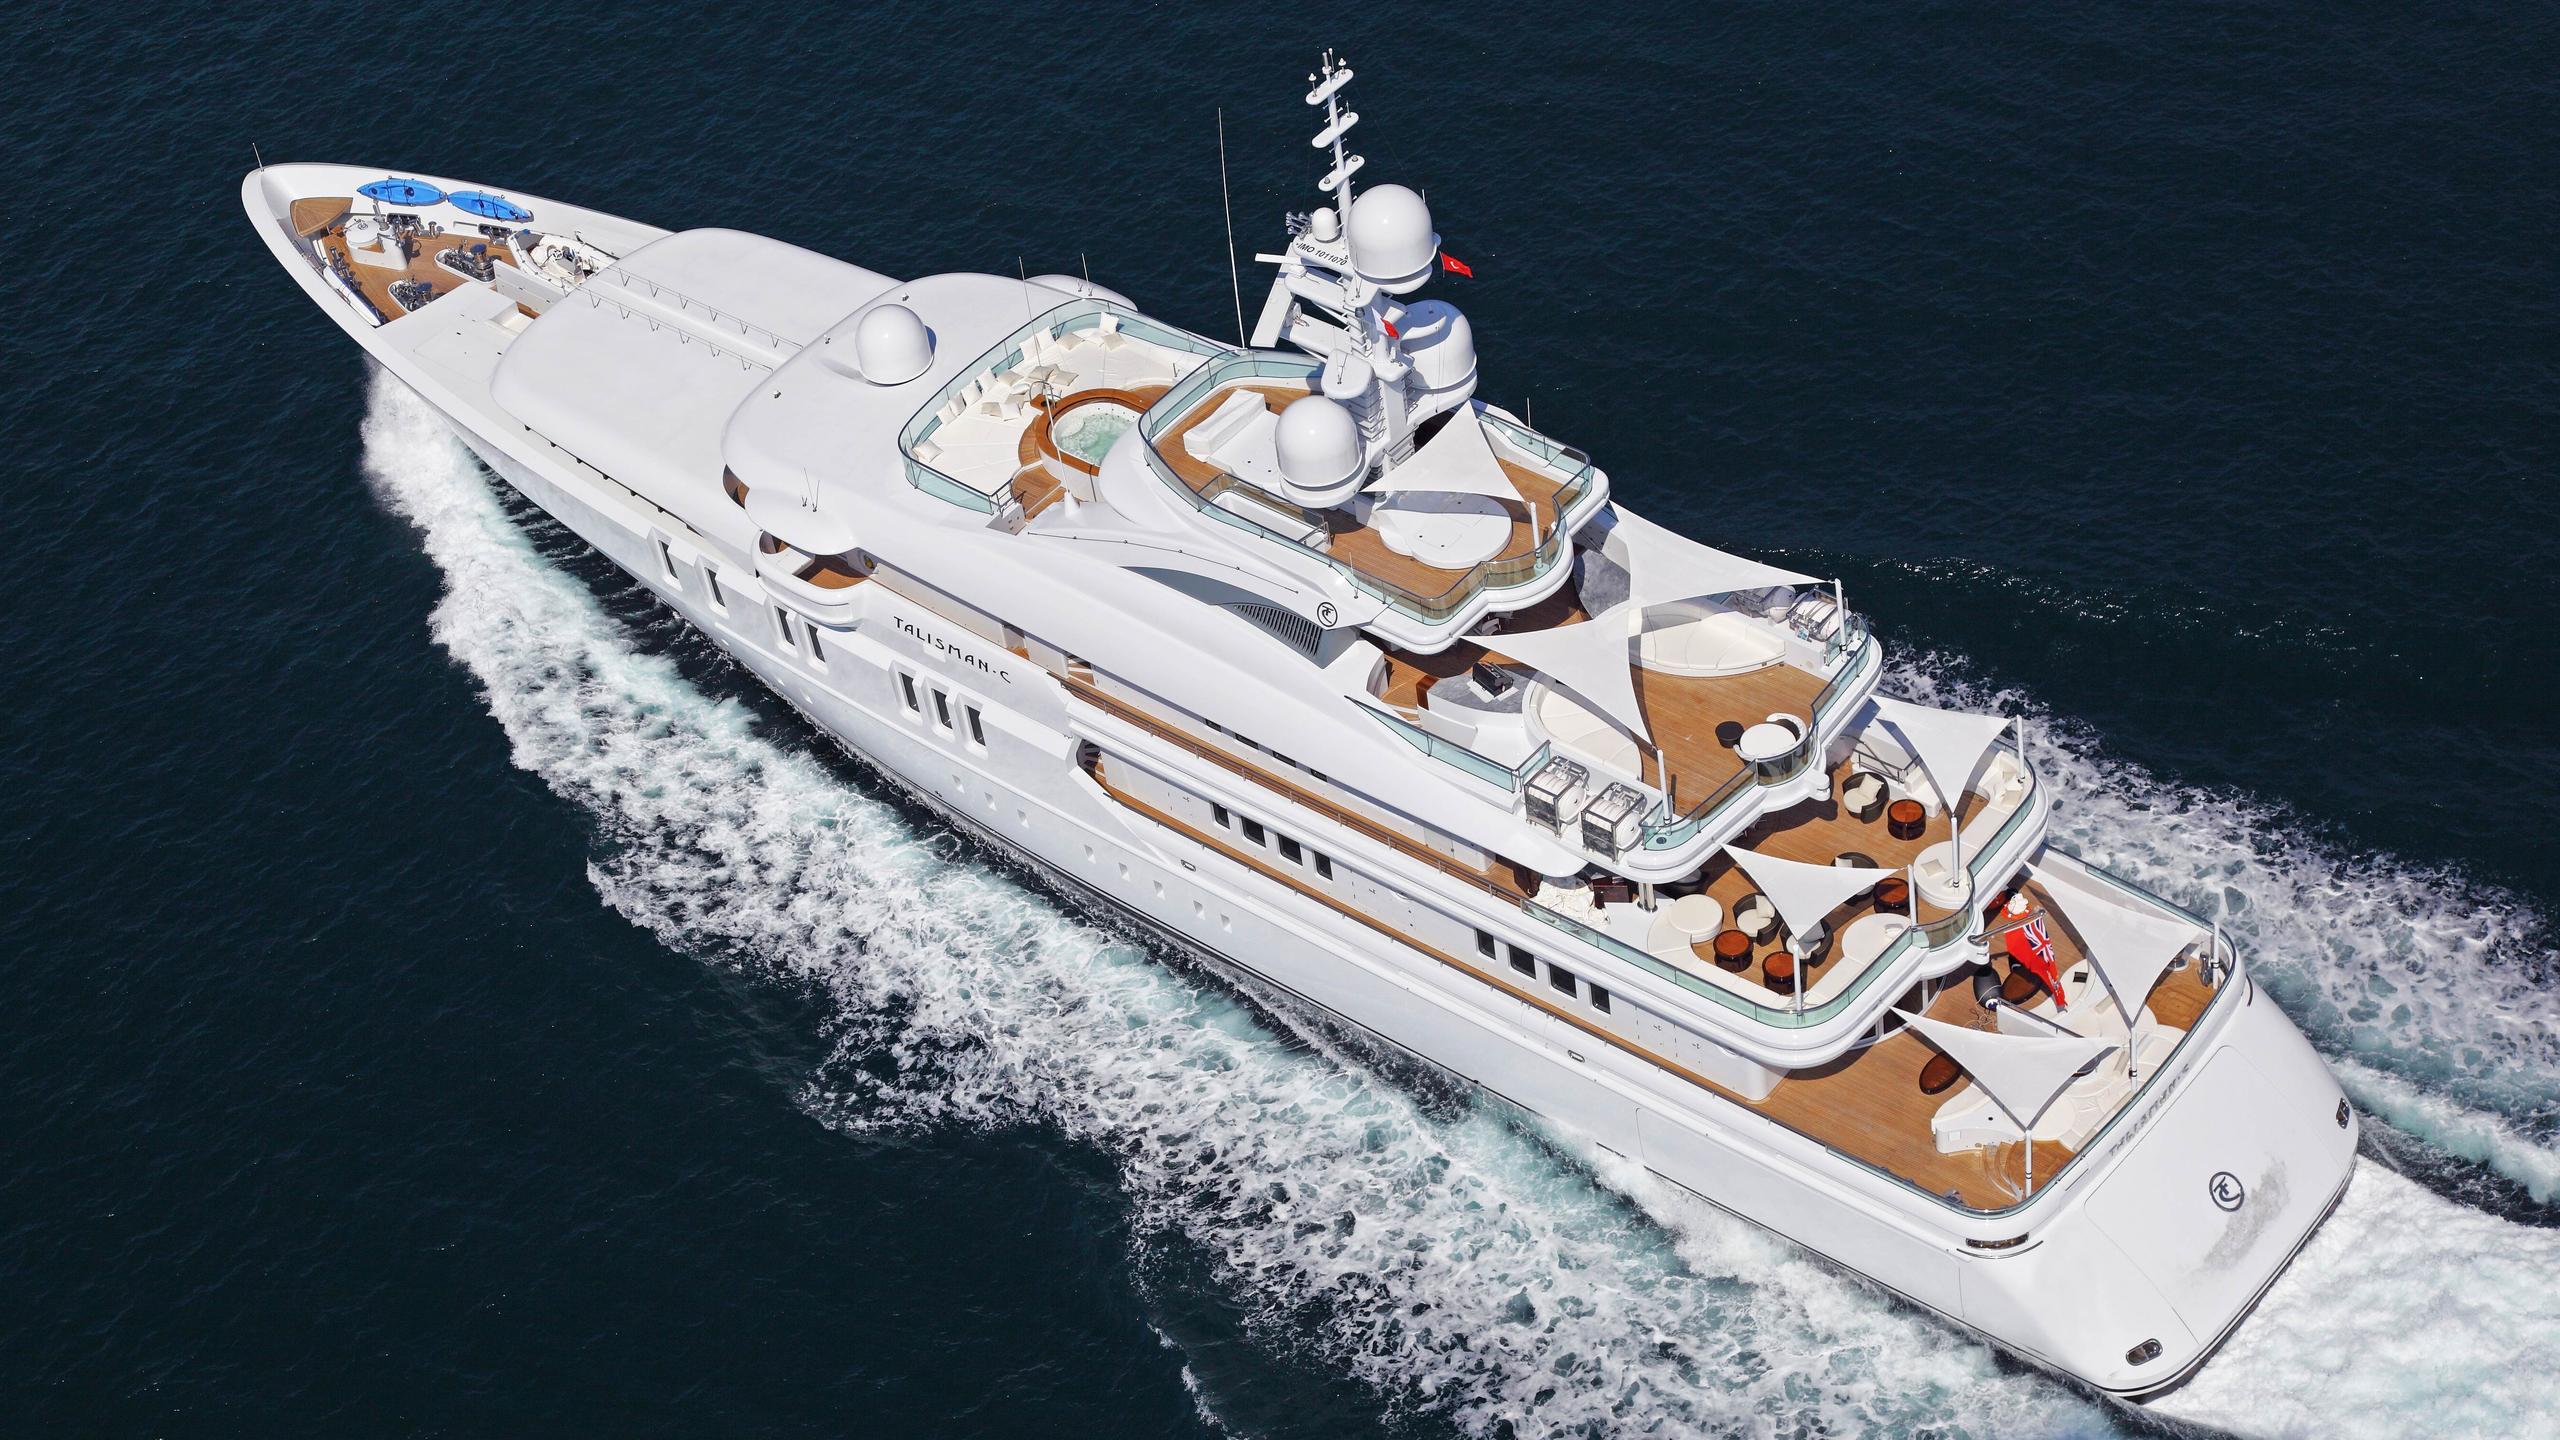 talisman-c-motor-yacht-Turquoise-2011-71m-aerial-cruising